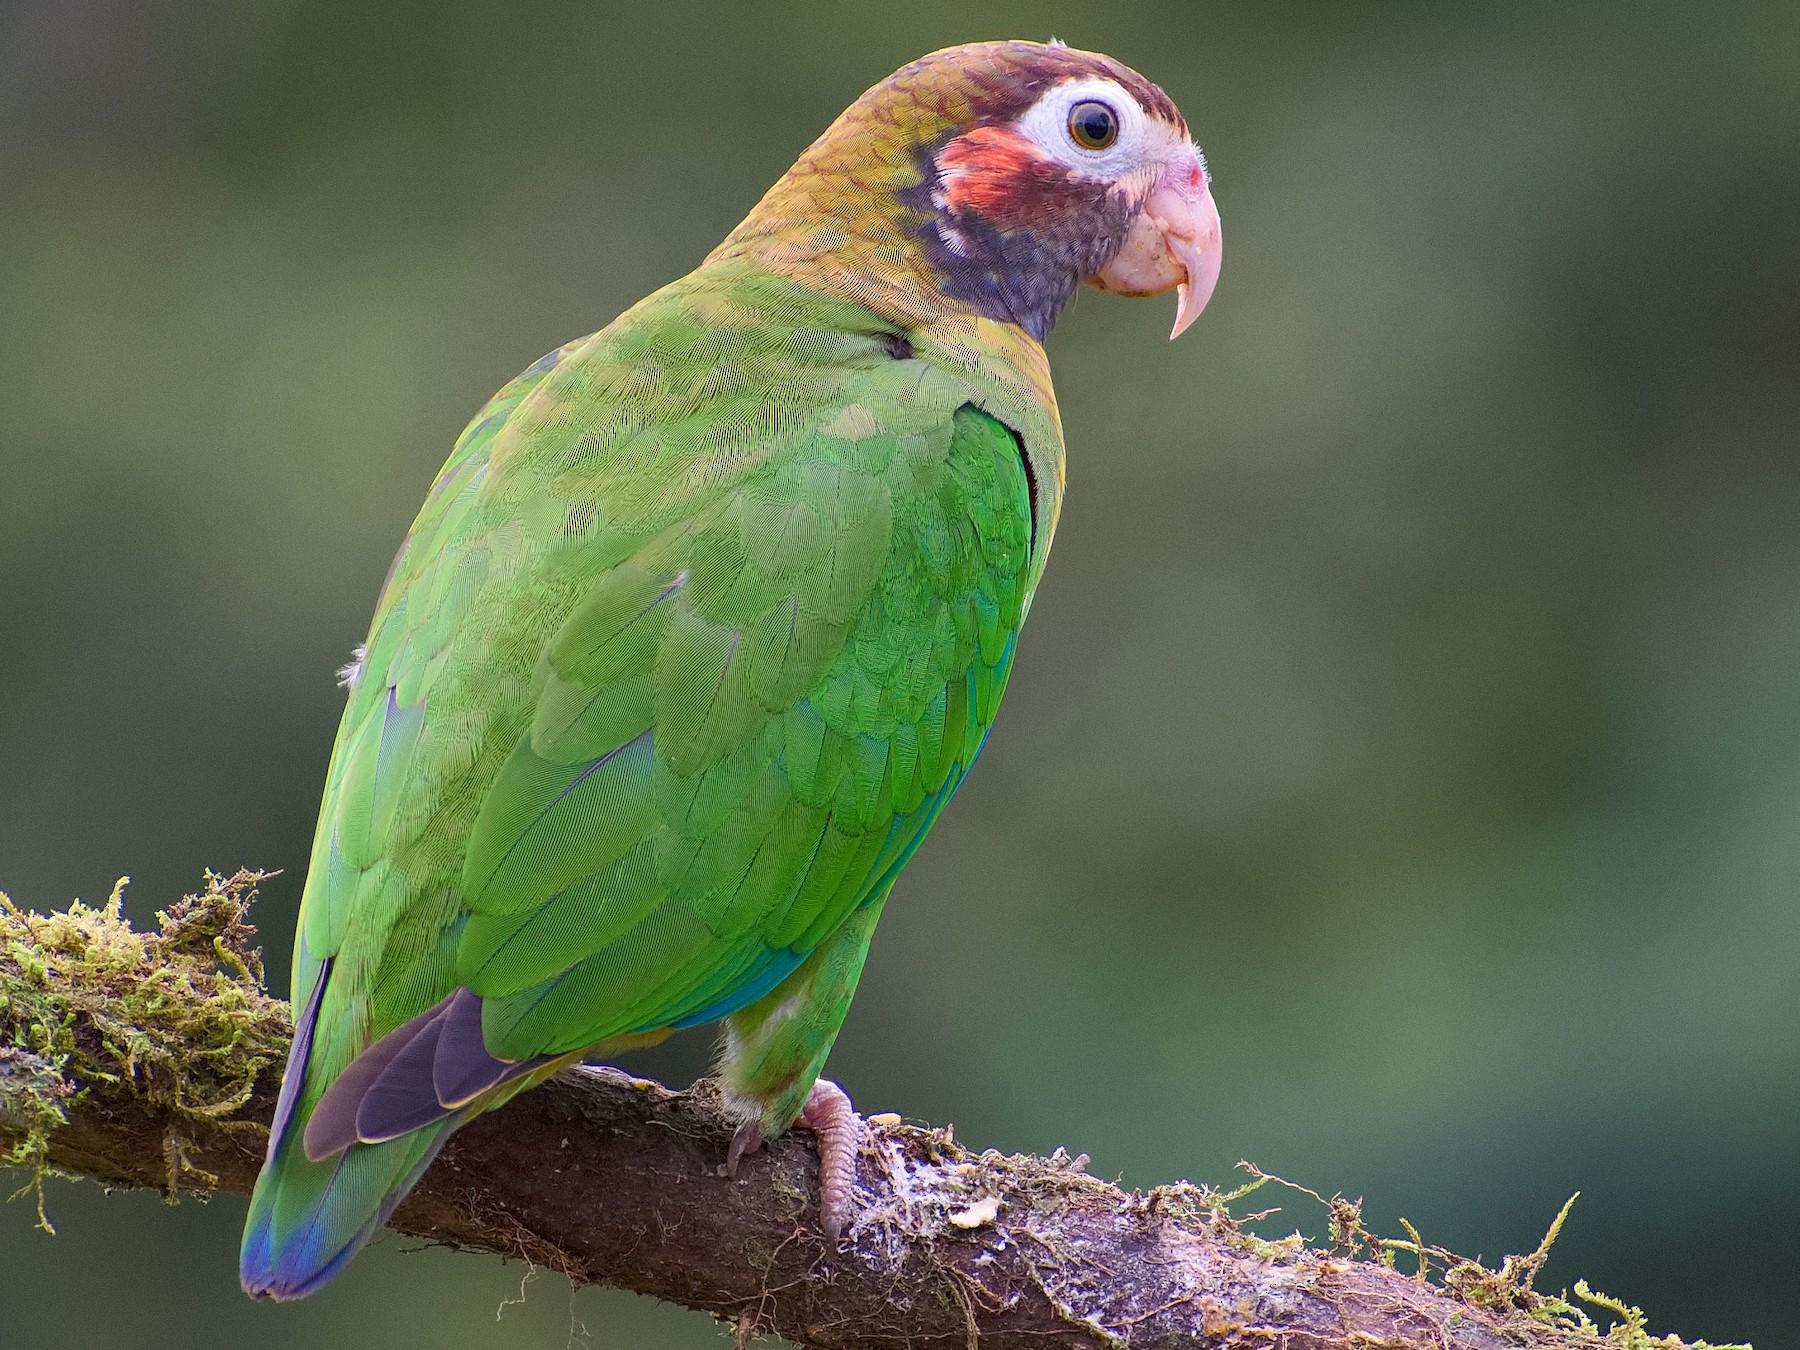 Brown-hooded Parrot - Christopher Becerra